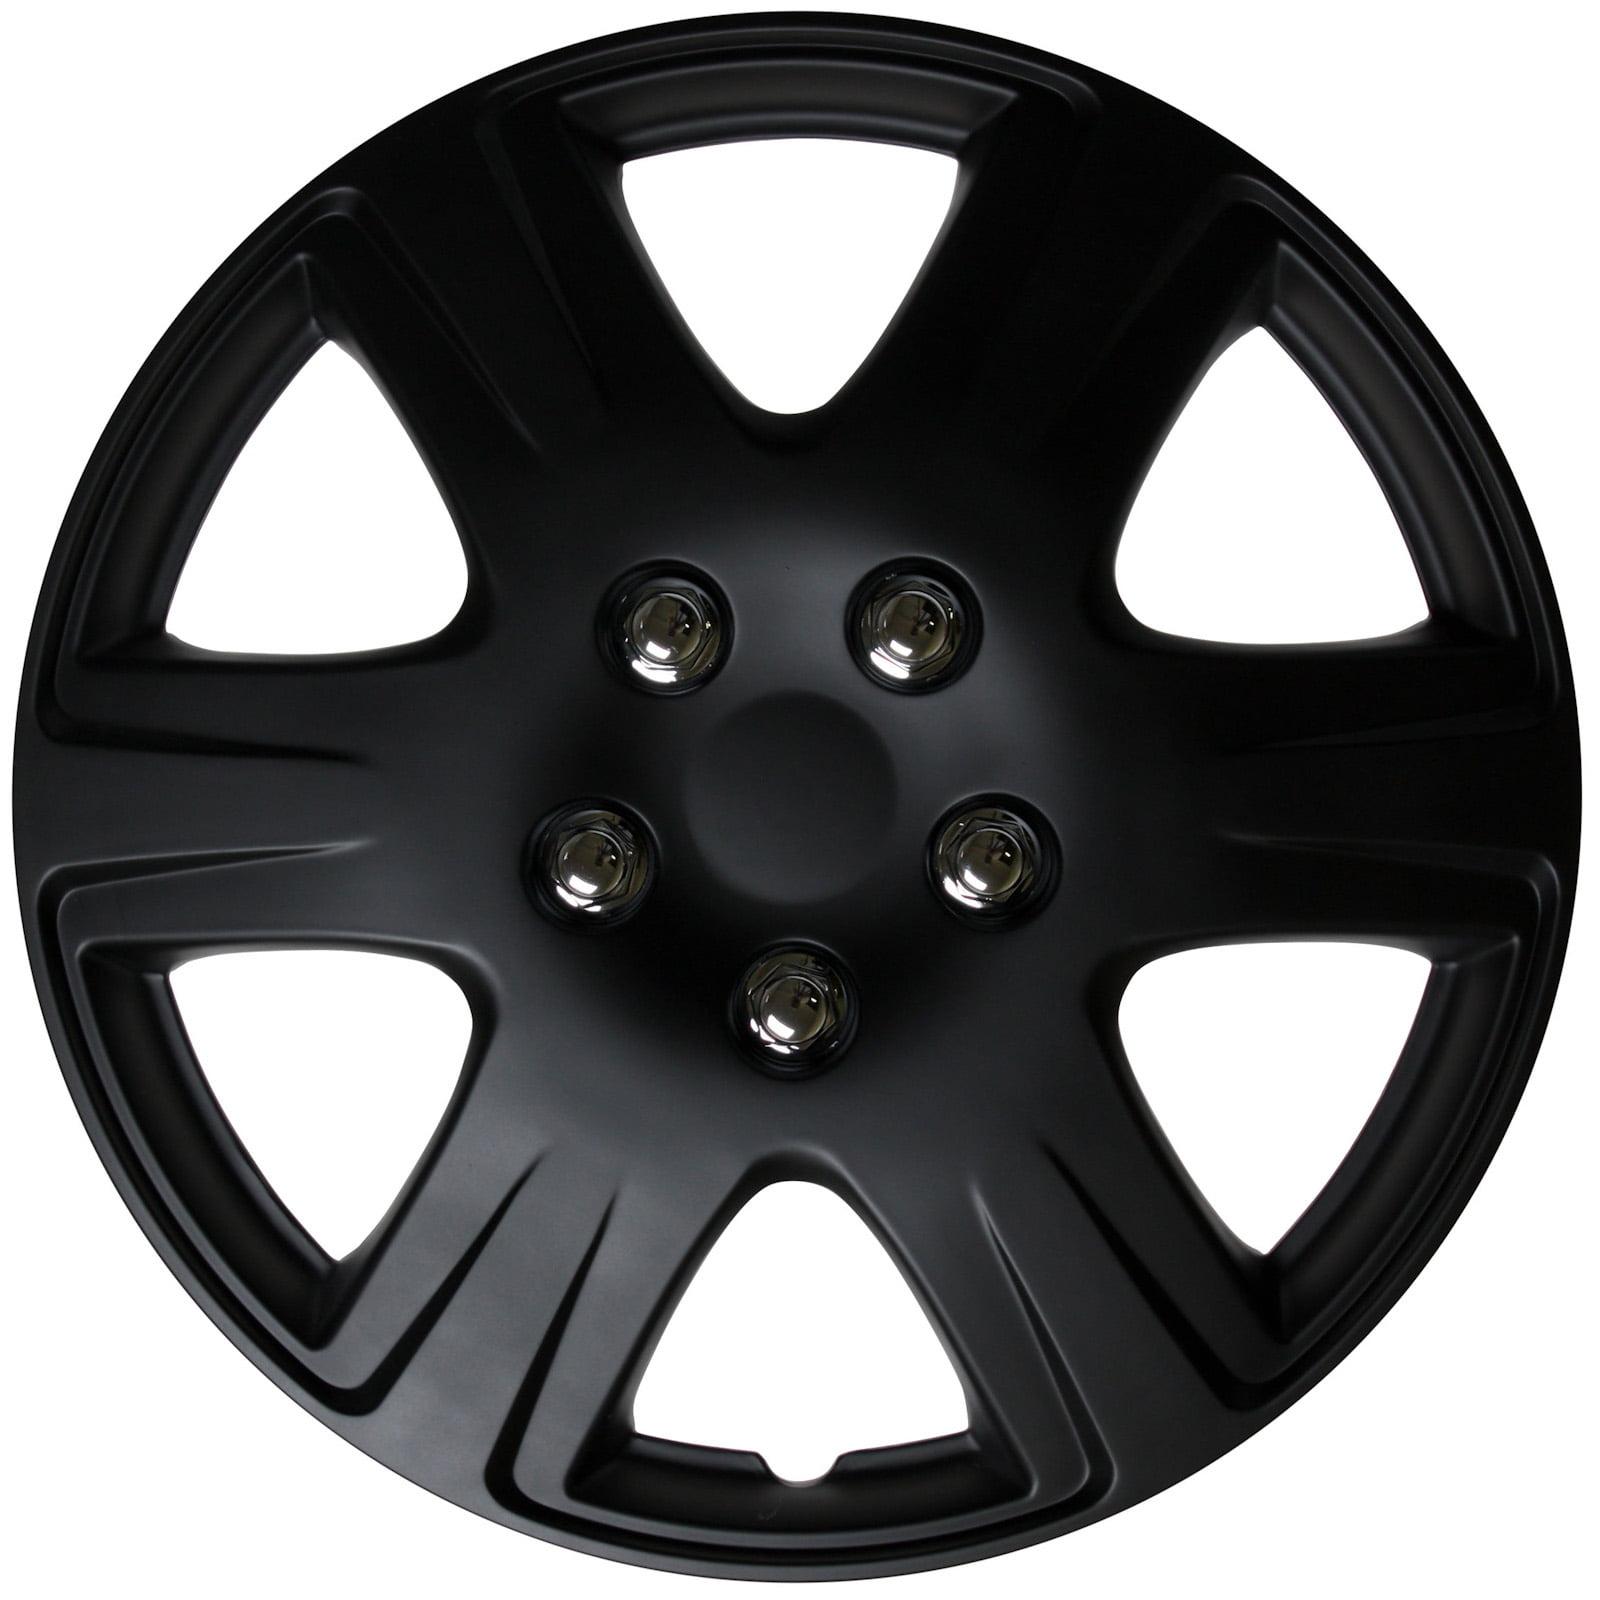 "cover trend (set of 4), universal 15"" black matte hub caps wheel"